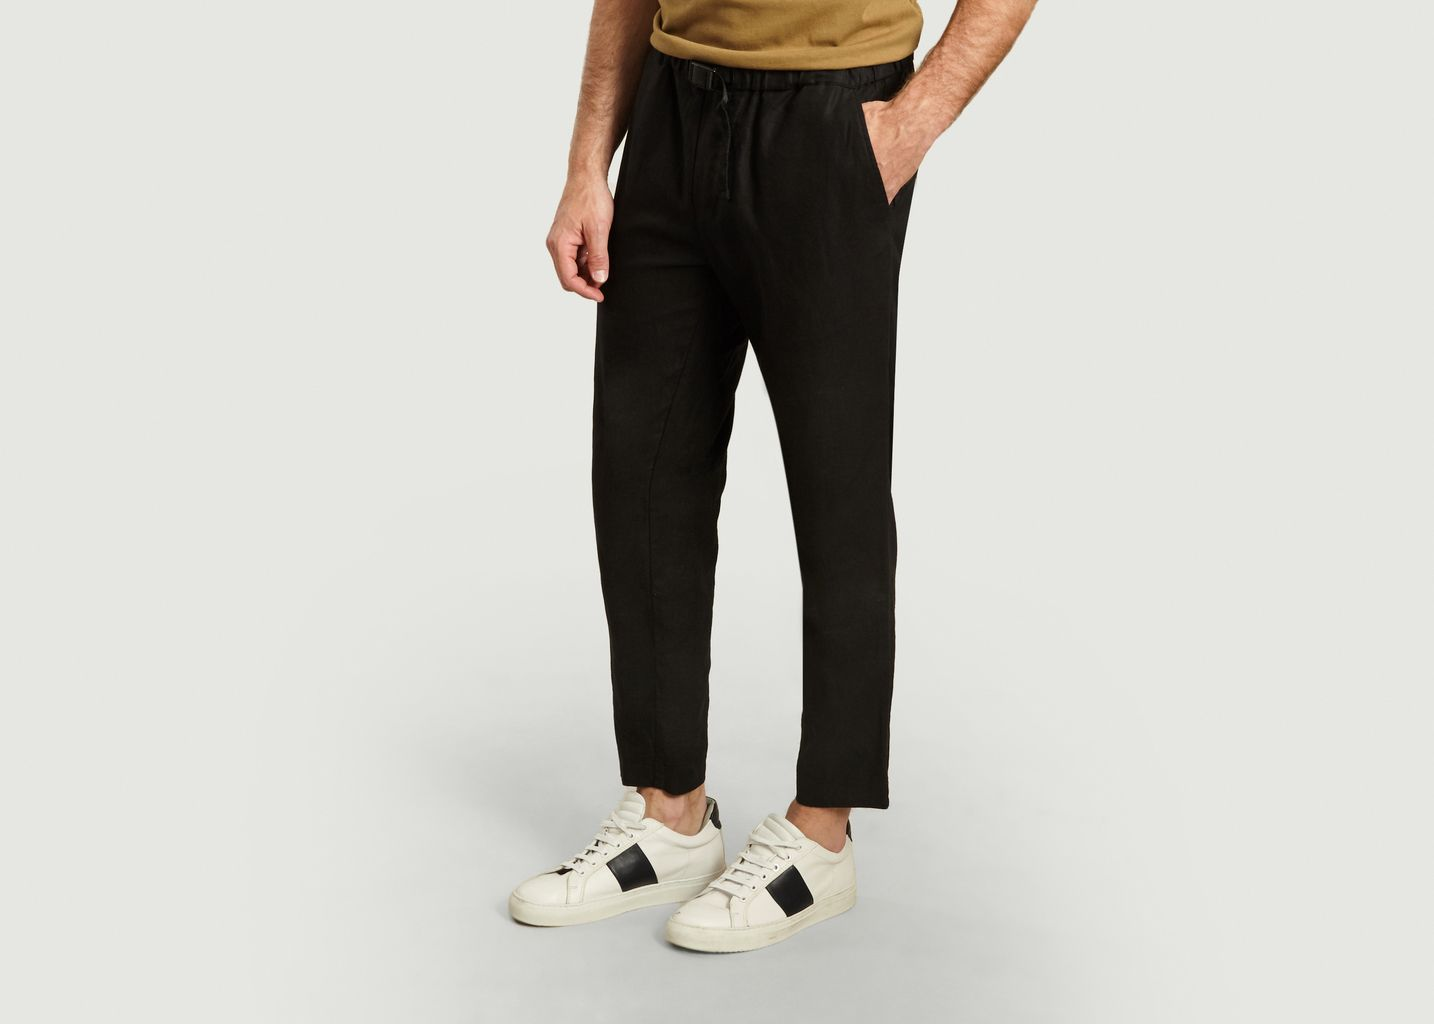 Pantalon en lin et coton bio Agnar - Samsoe Samsoe